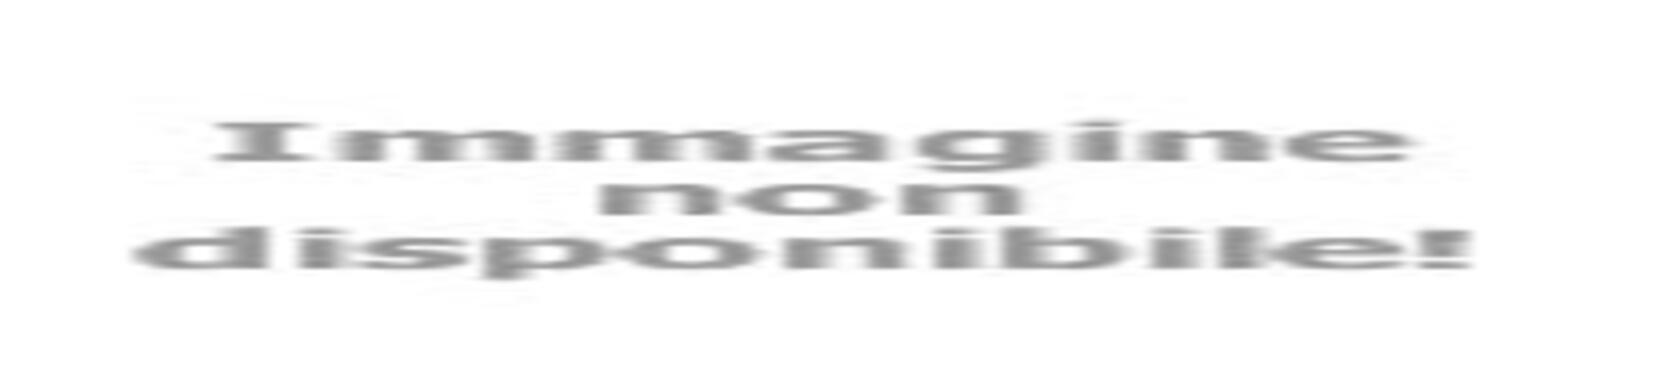 basketriminicrabs it 6-1103-video-ceccarules-n.22 005